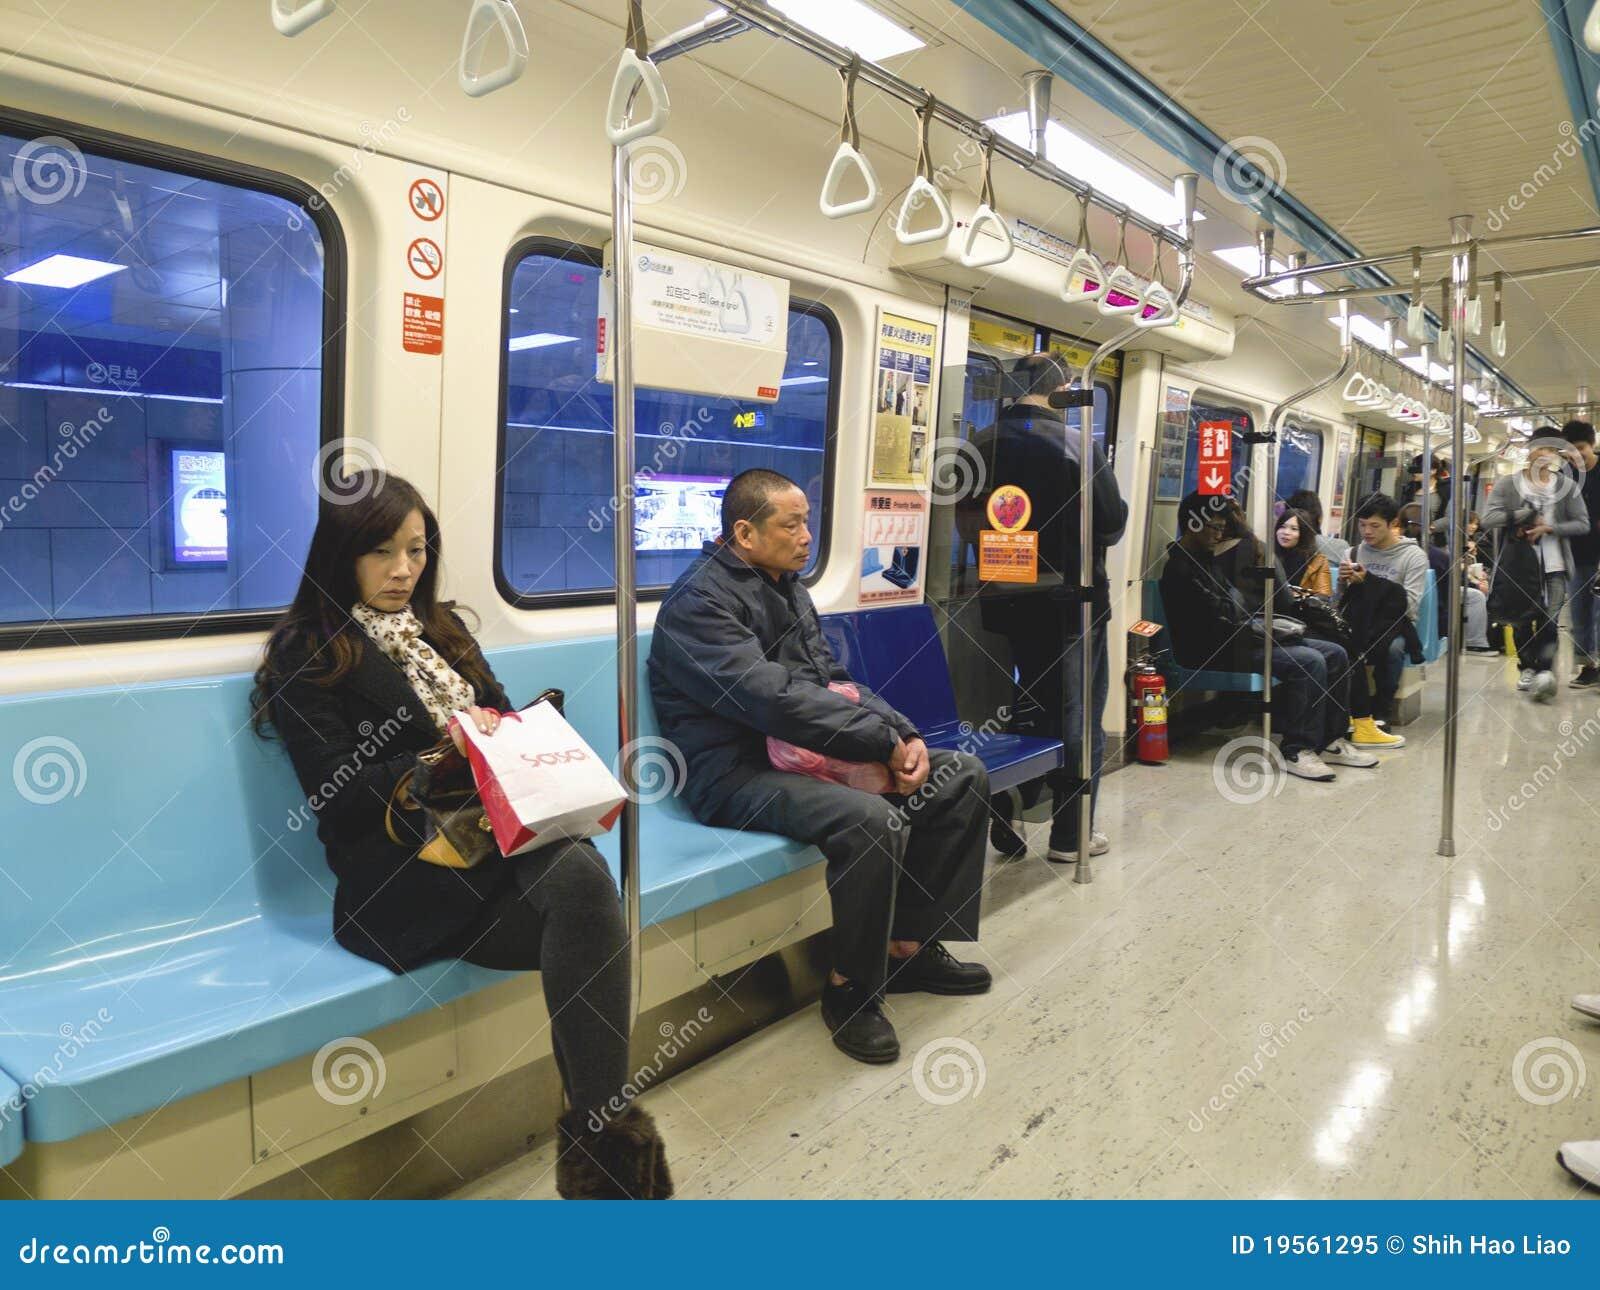 Inside metro carriage on february 6 in taipei editorial image image 19561295 - Carrage metro ...